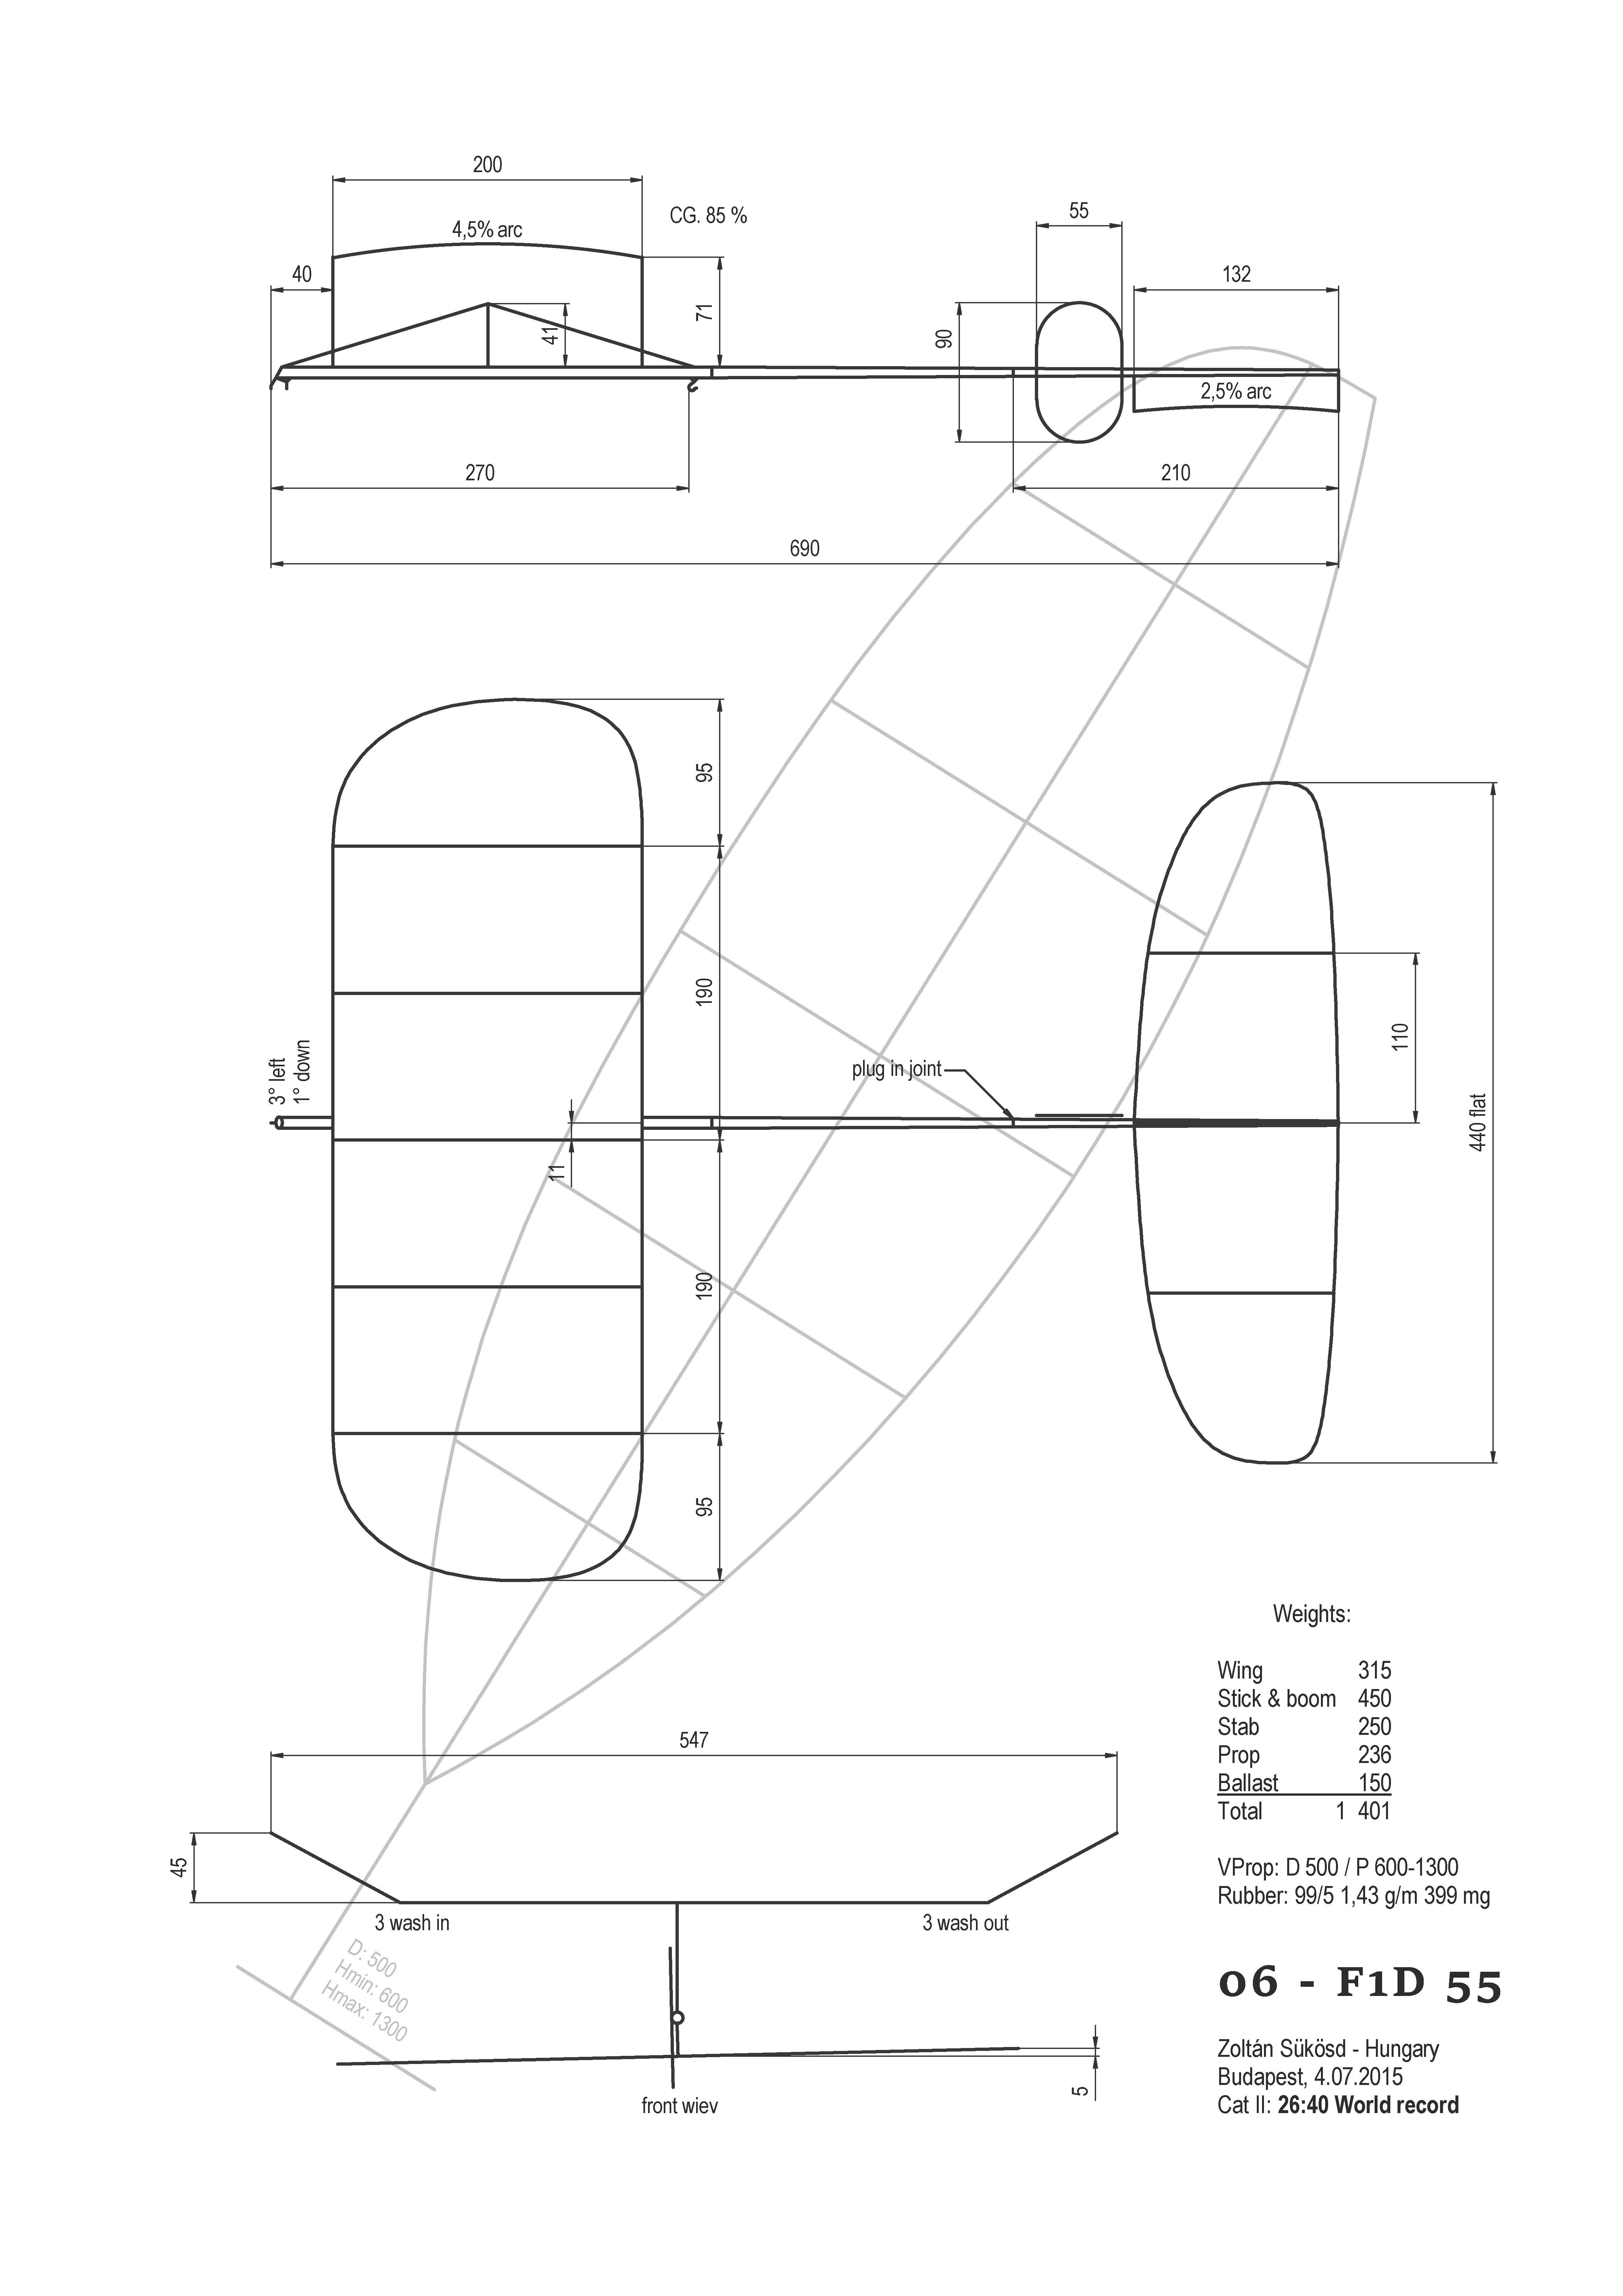 site metallurgygce.files.wordpress.com pdf